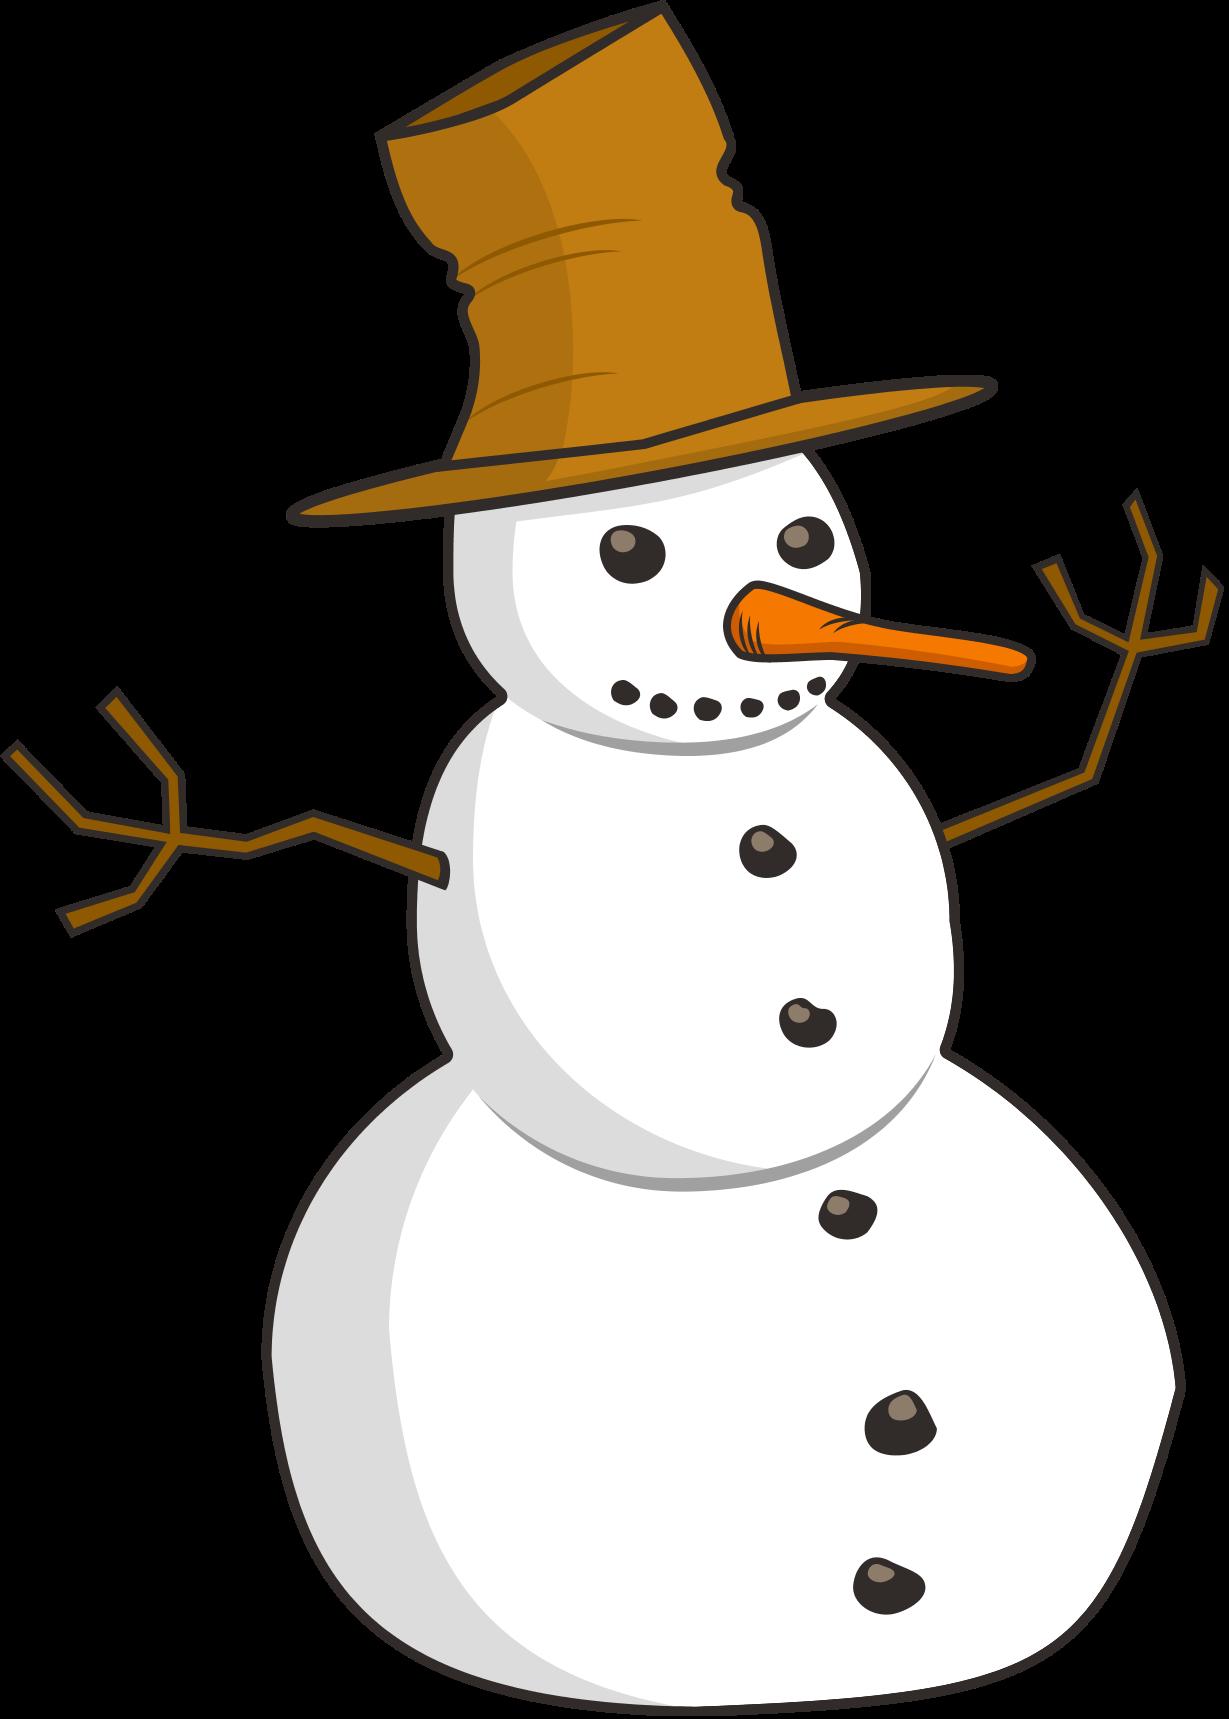 1229x1719 Free Snowman Clipart Christmas Clip Art Images Image